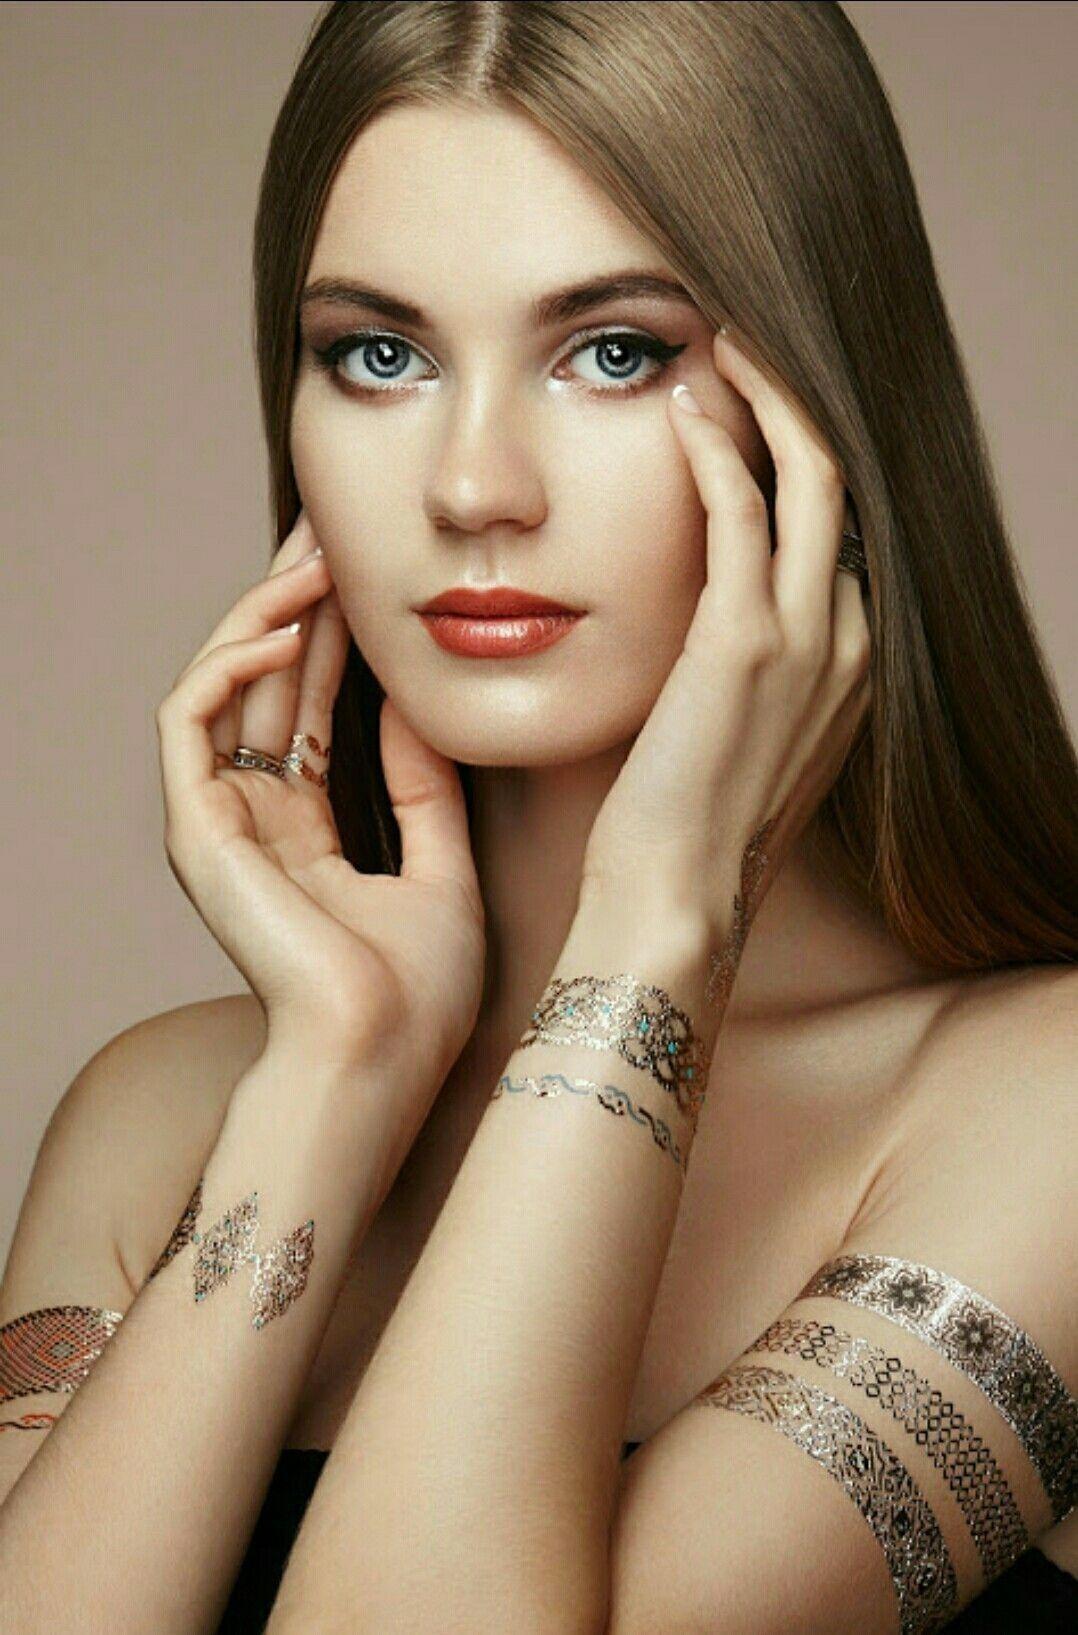 8f9f47fea0f5 The enchanting Lily of the Valley, Russian model Alexandra Brutskaya ...